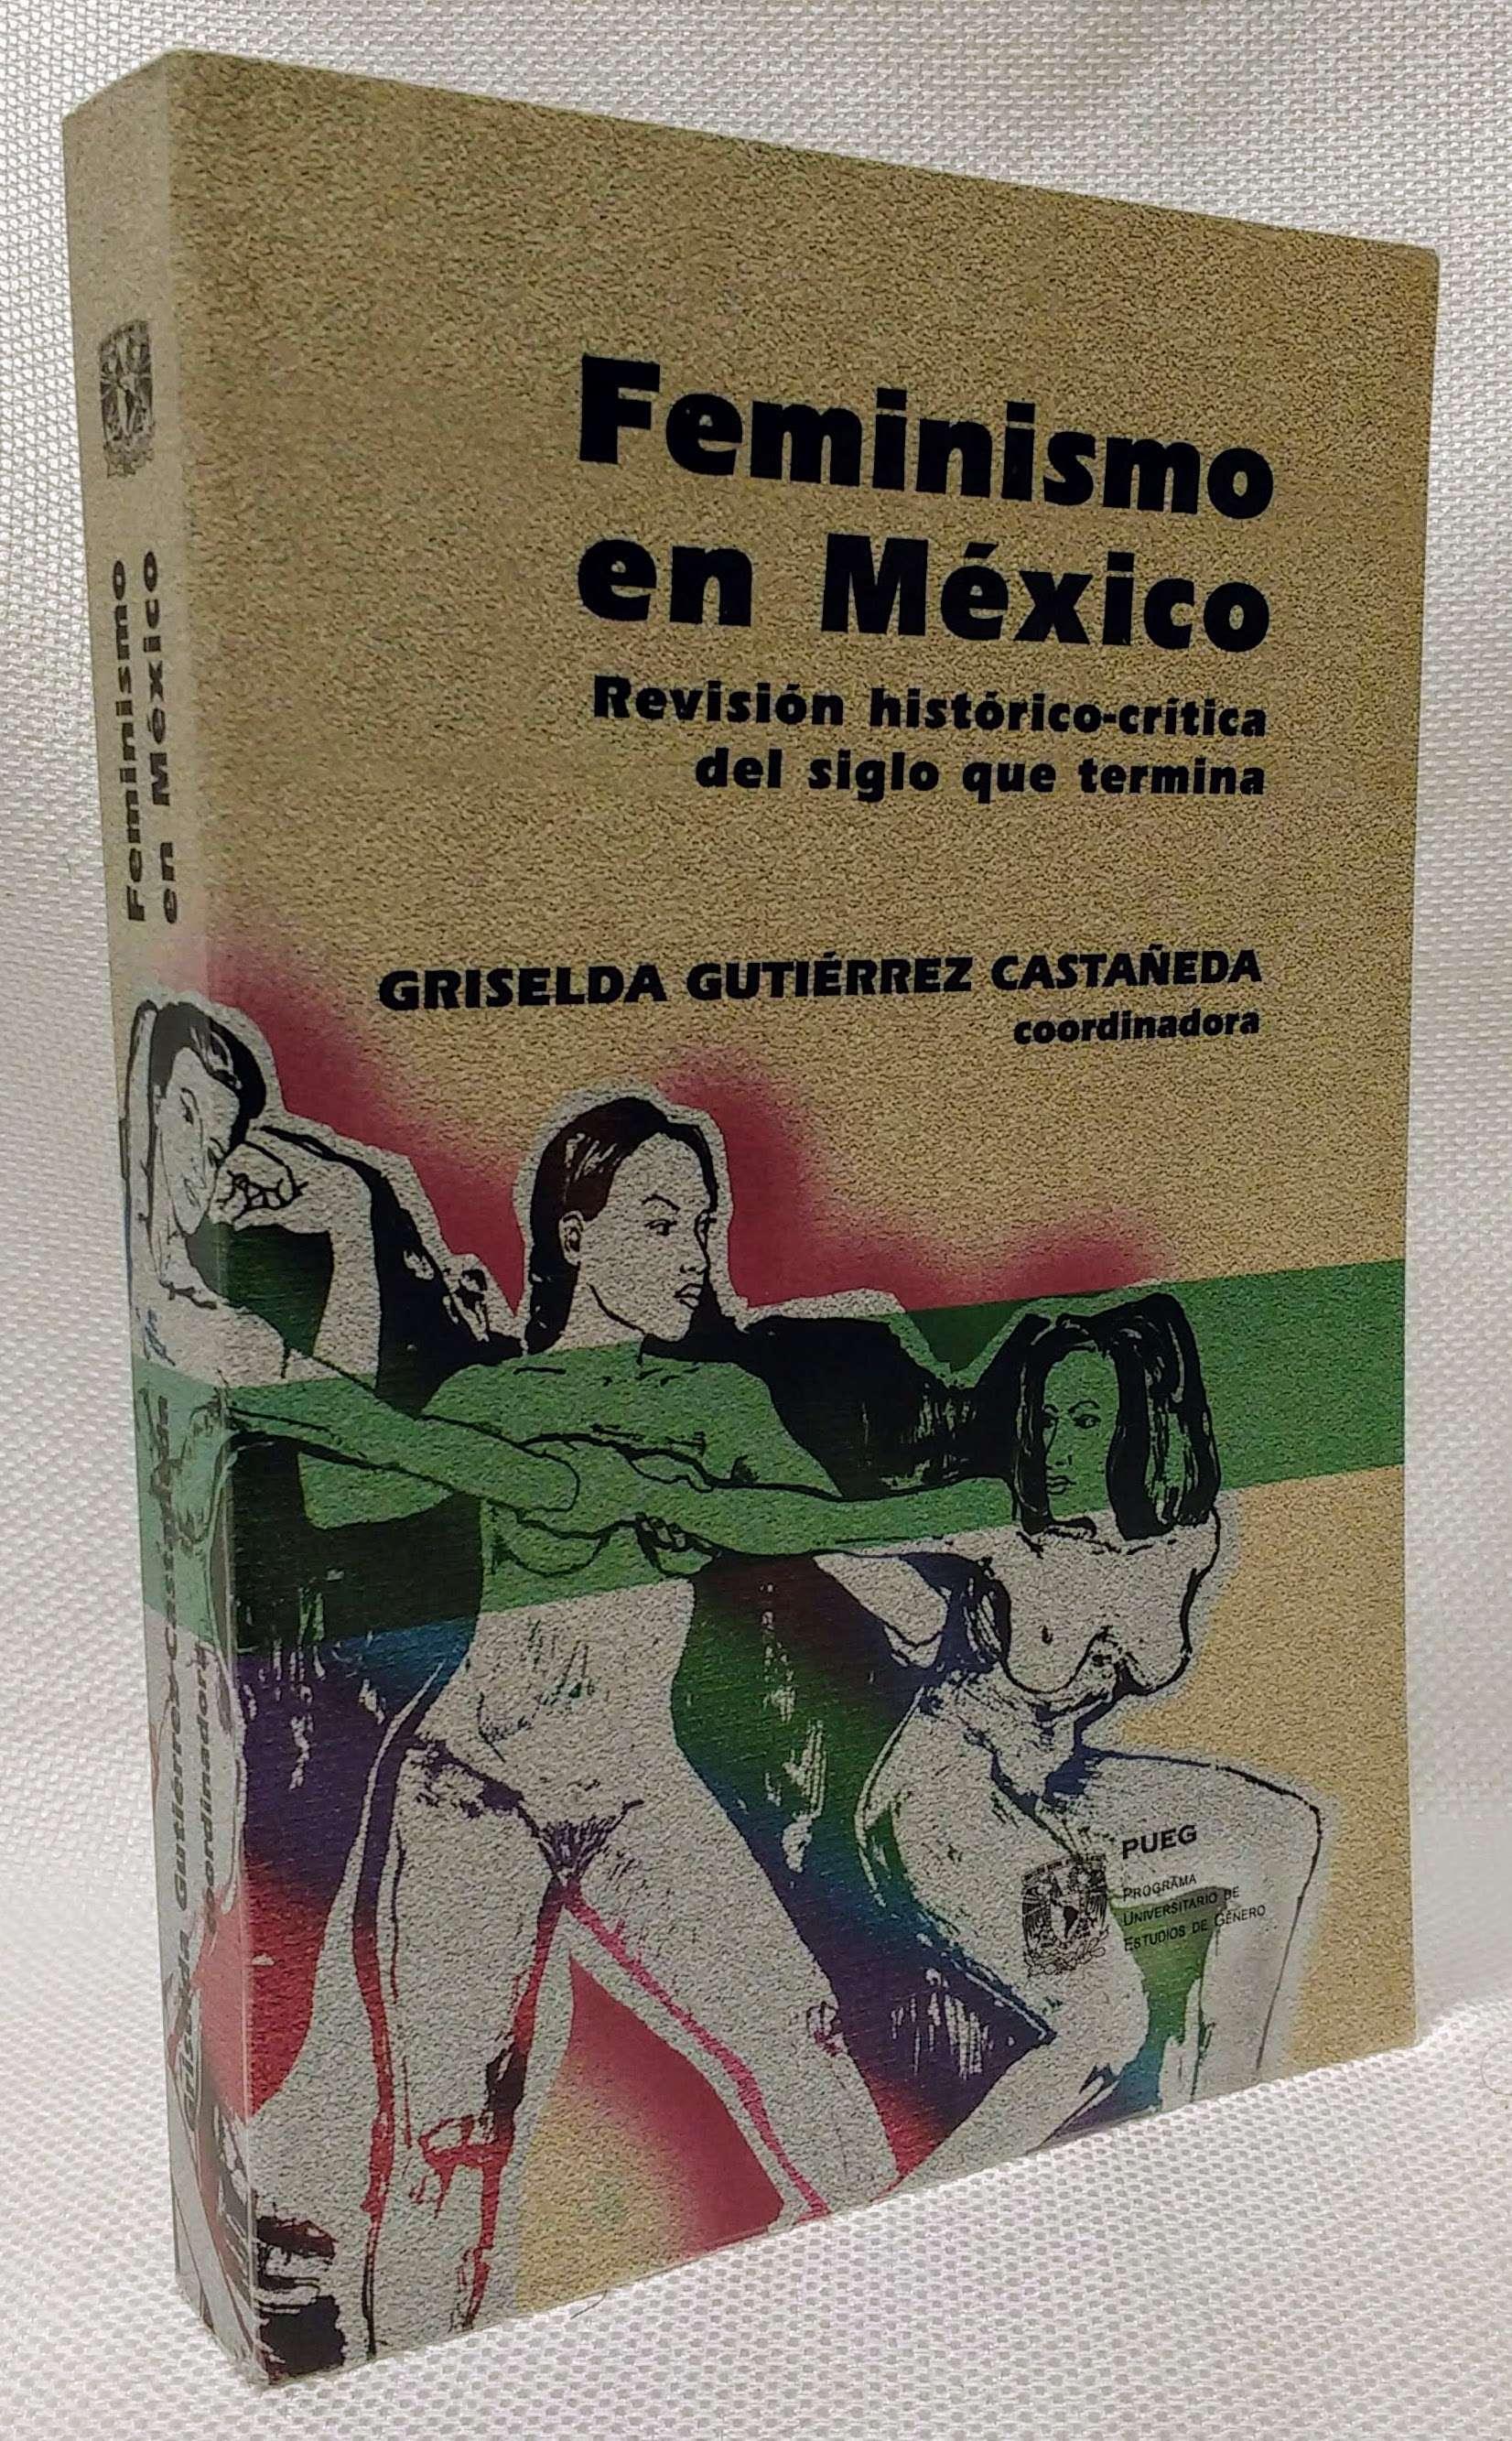 Feminismo en mexico / Feminism in Mexico: Revision historico-critica del siglo que termina (Spanish Edition), Gutierrez Castaneda, Griselda [Compiler]